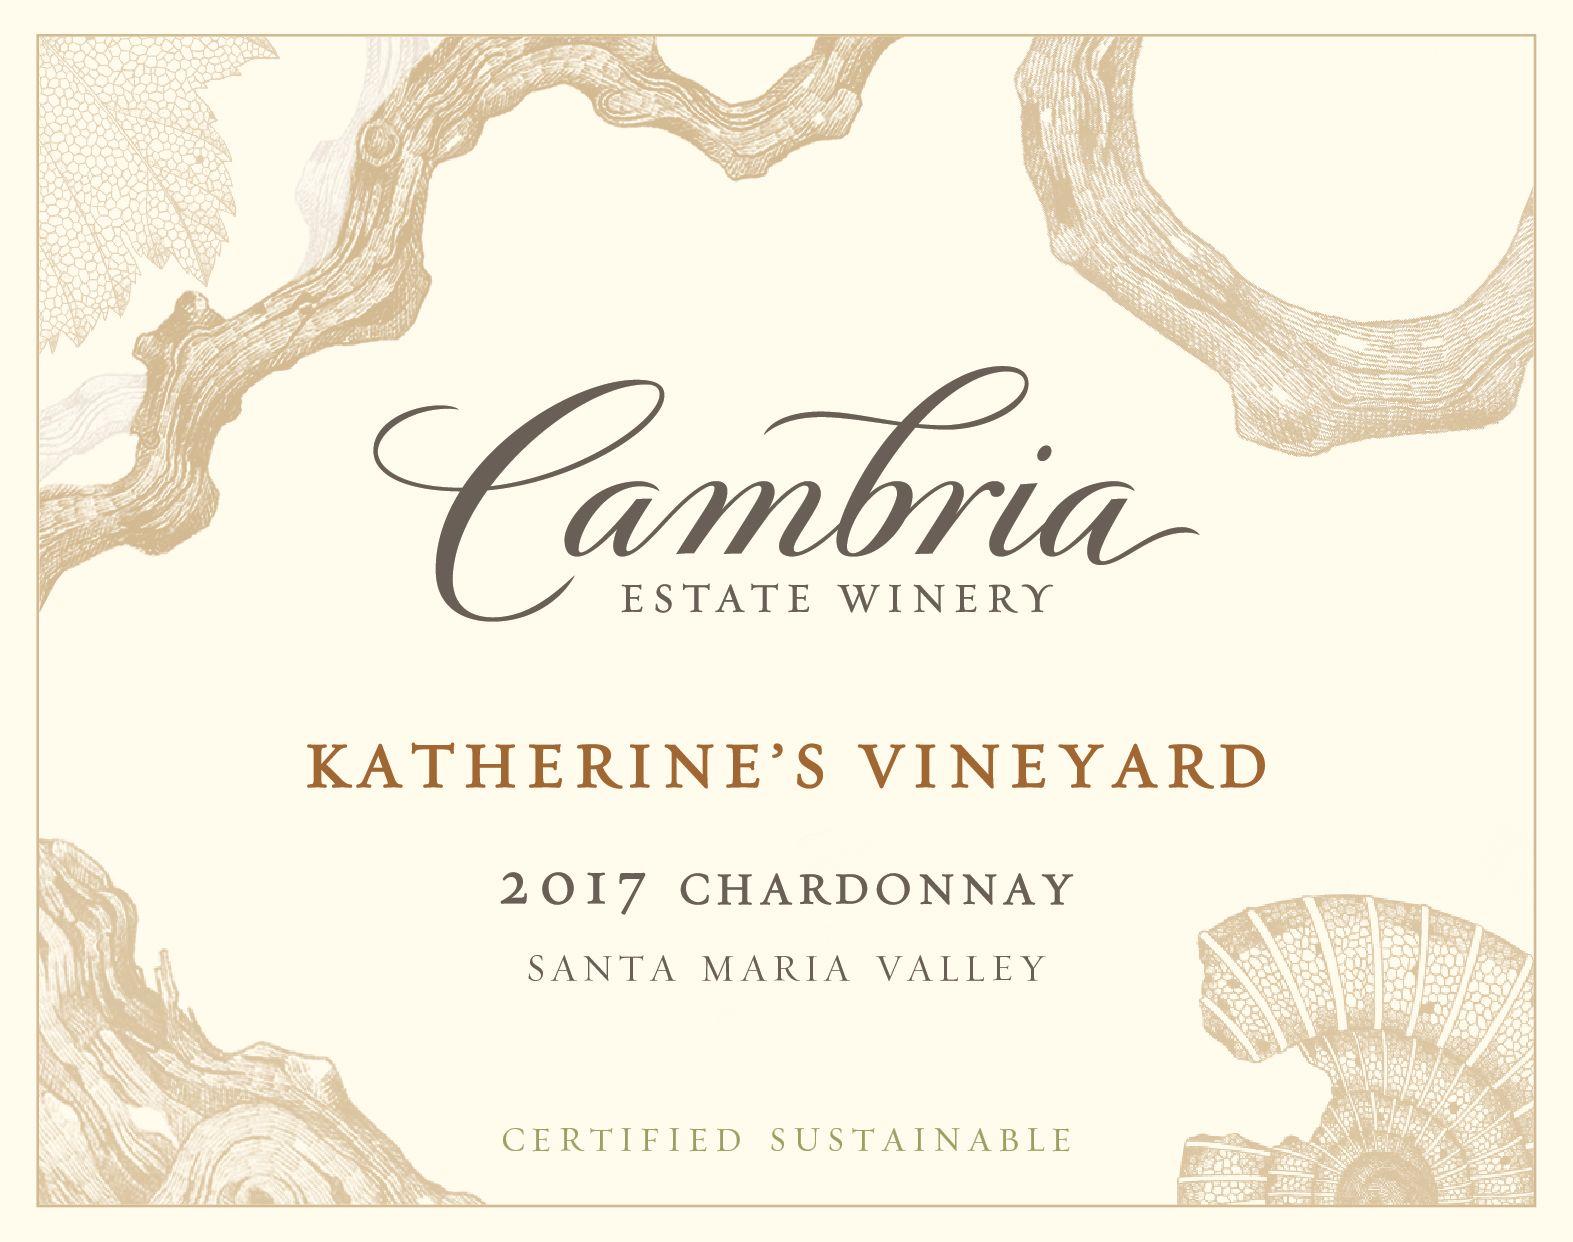 Cambria Katherine's Vineyard Chardonnay 2017